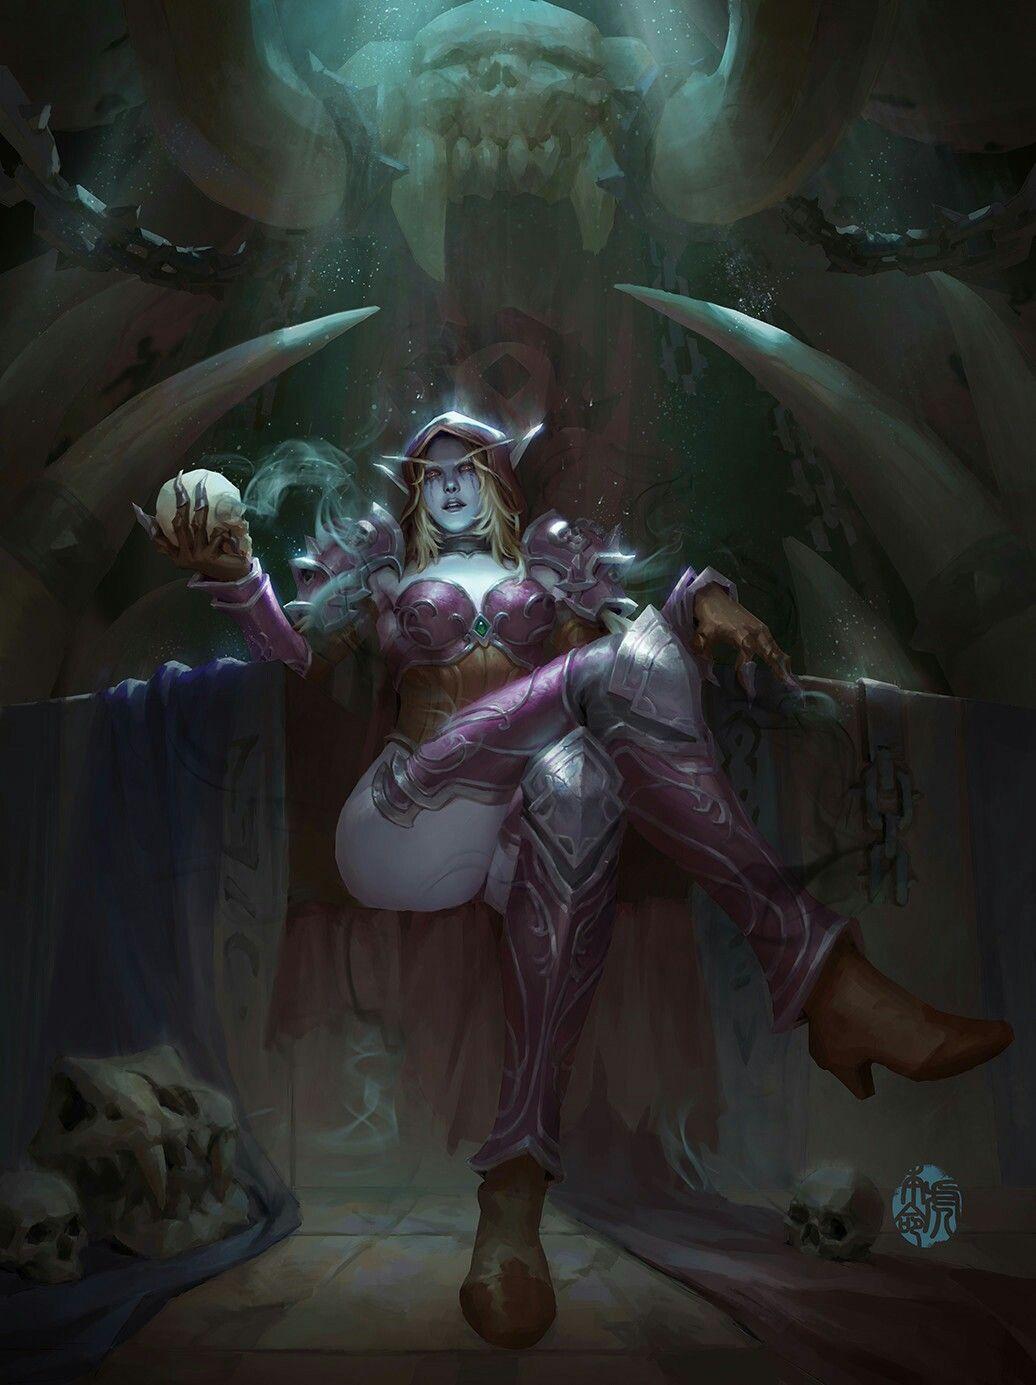 Pin by Iosif O. on Sylvanas Windrunner | Warcraft art